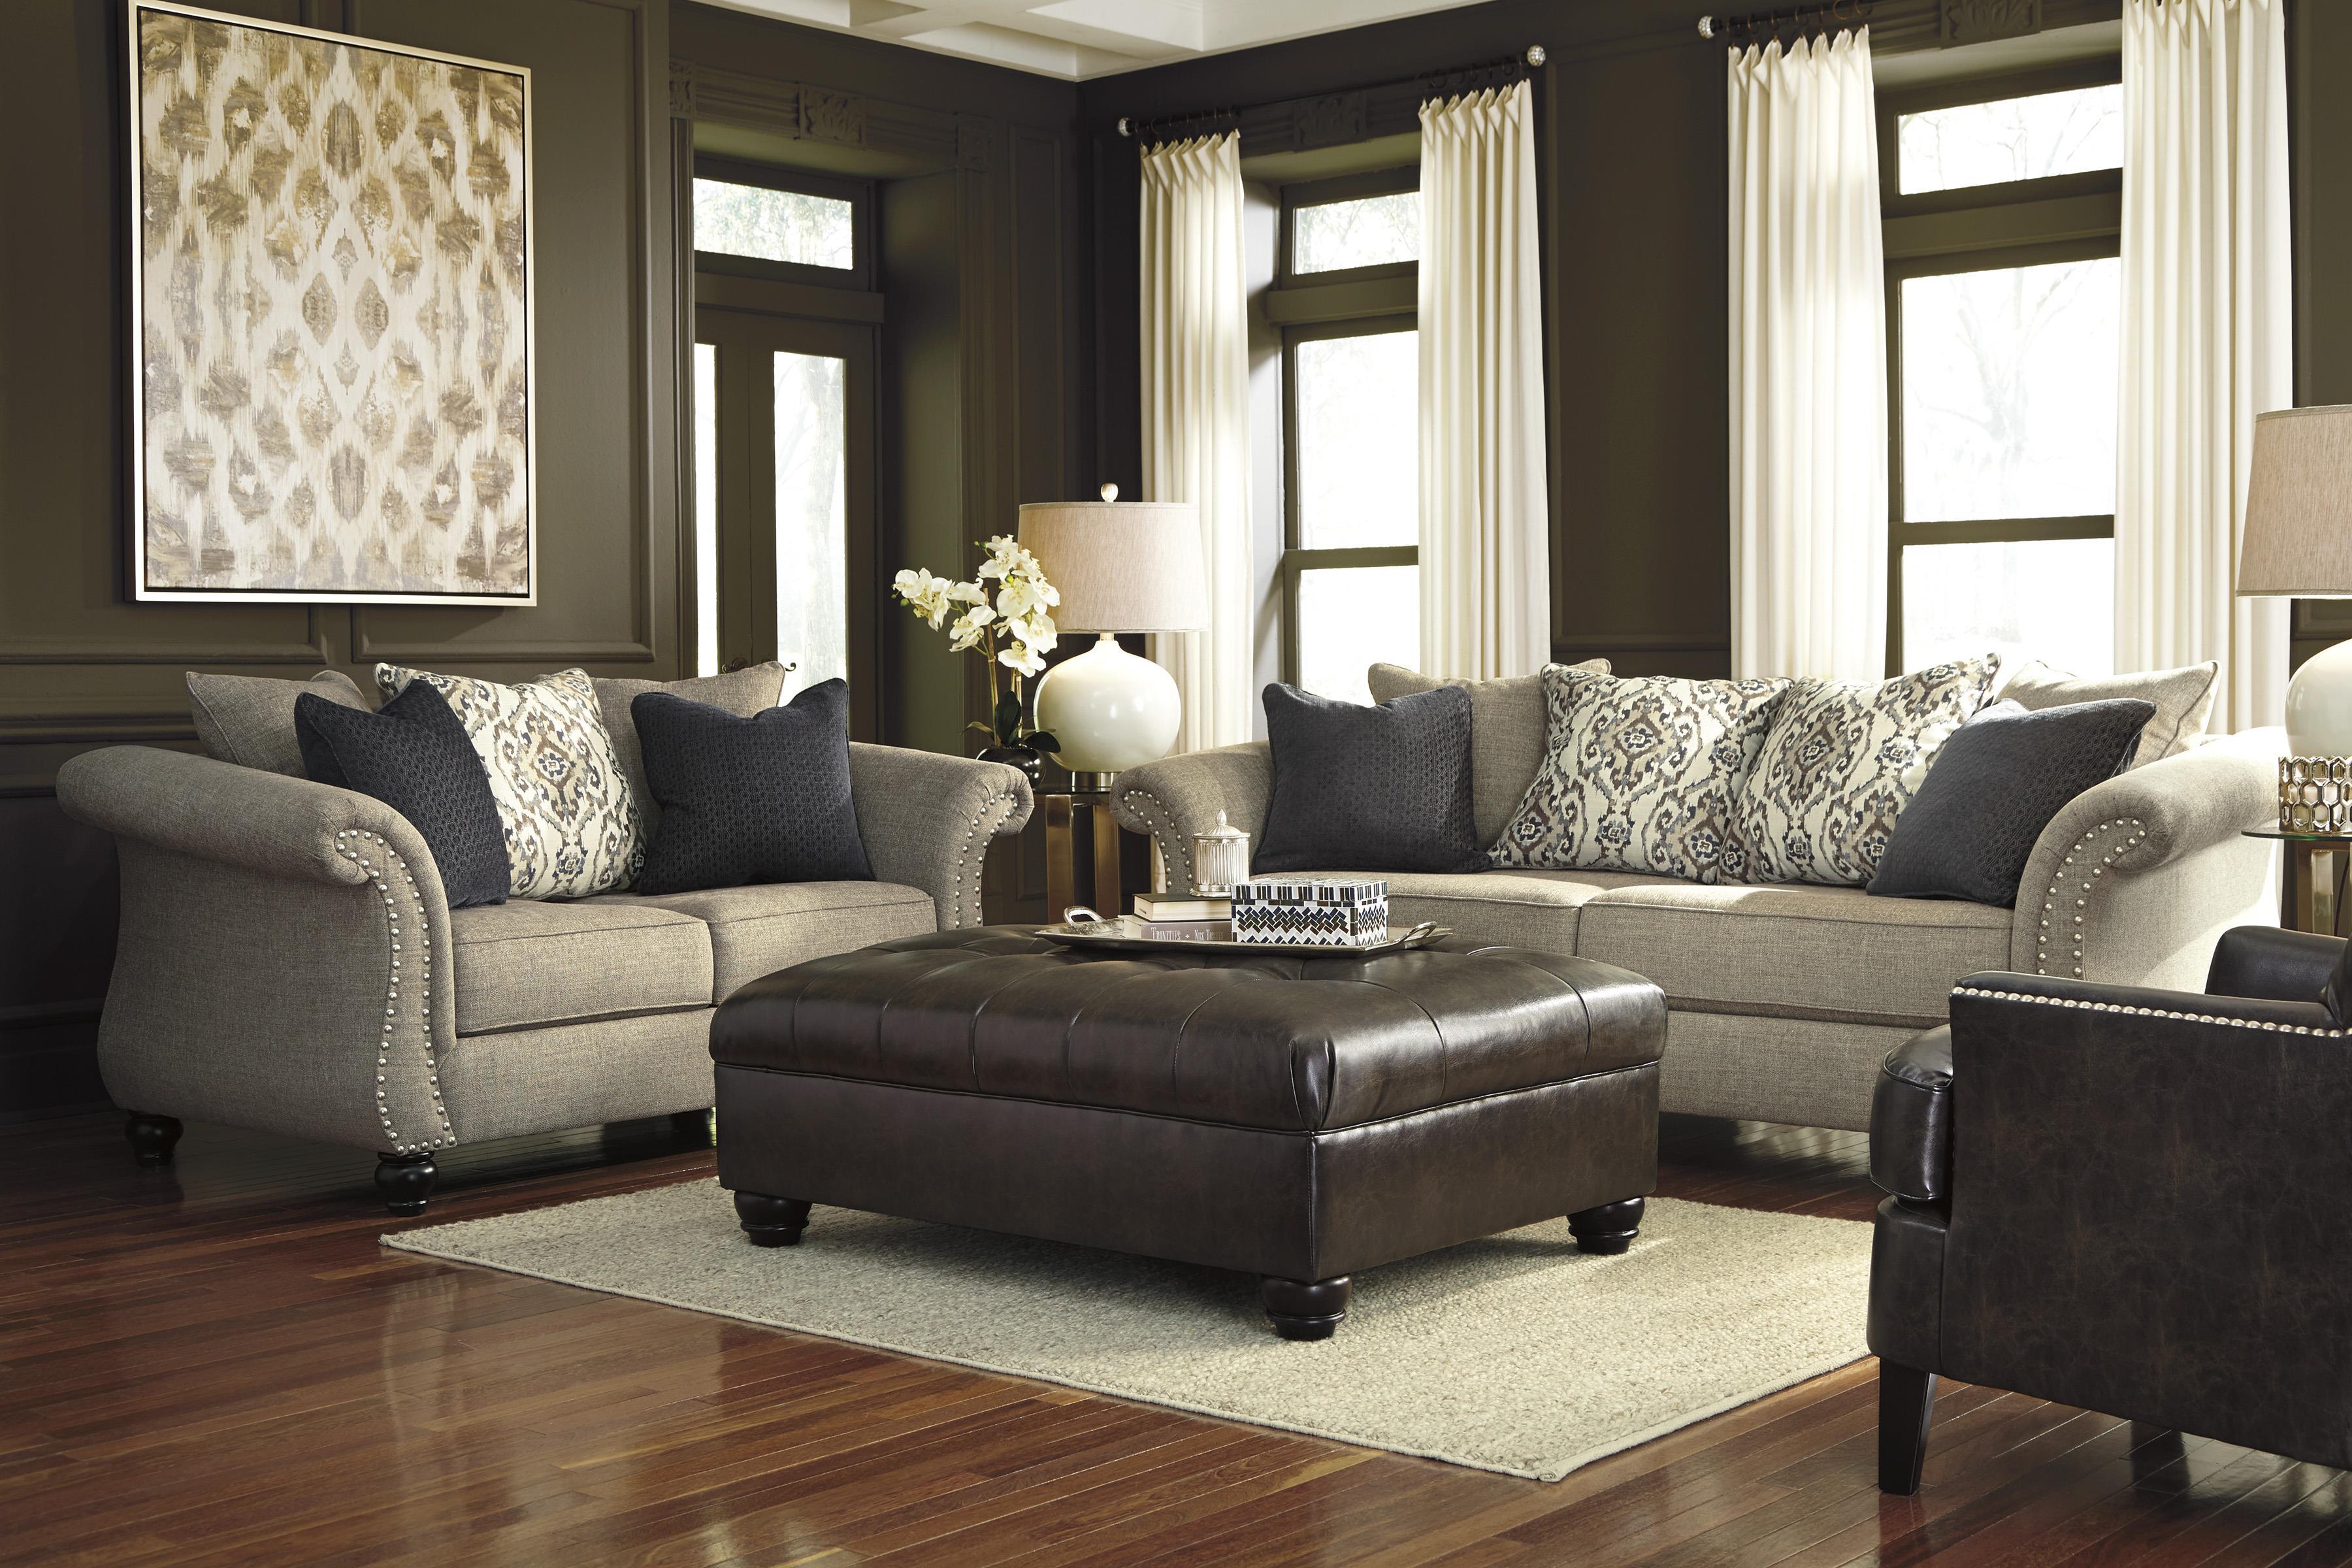 Benchcraft Jonette Stationary Living Room Group - Item Number: 46101 Living Room Group 3